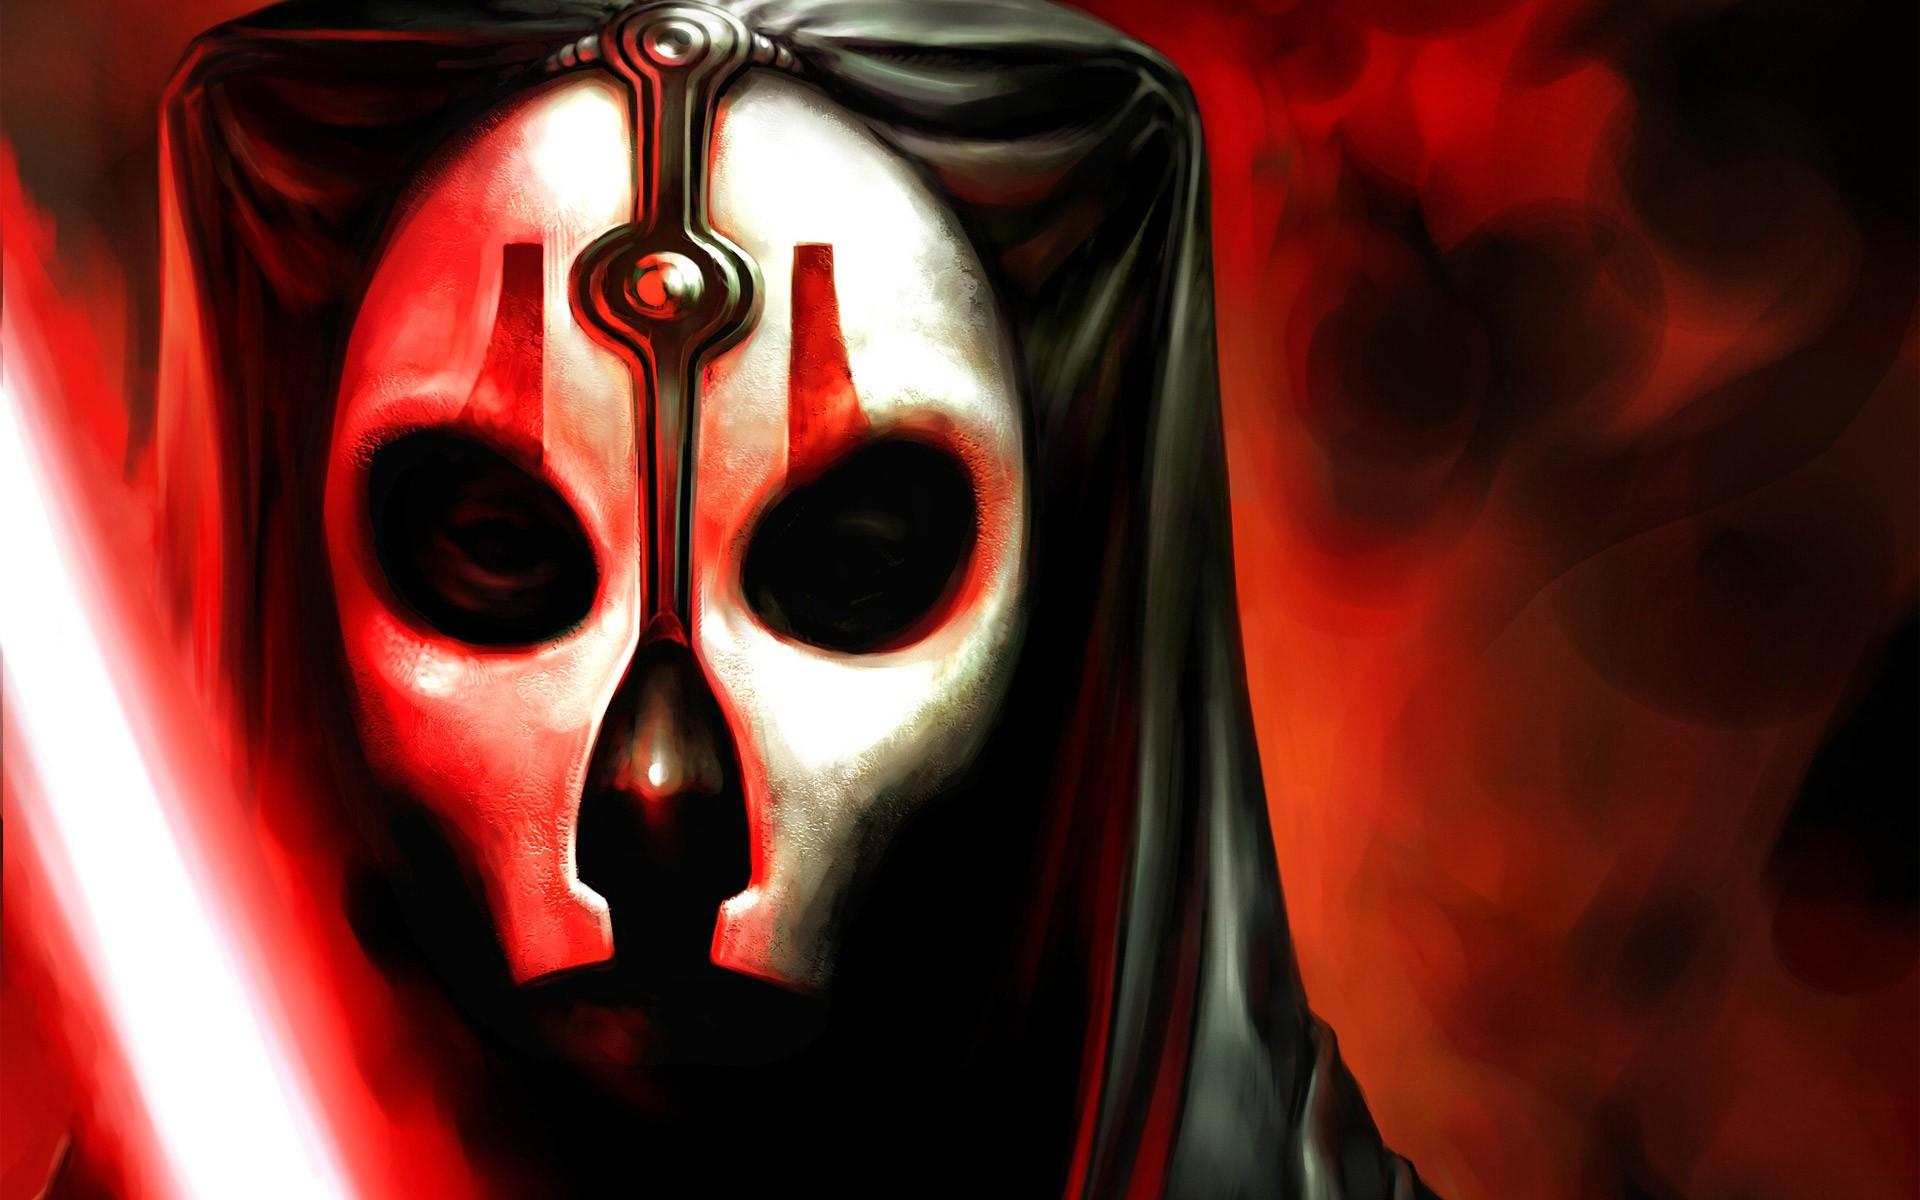 Best Wallpaper Halloween Star Wars - Star-Wars-red-mask-Darth-Nihilus-darkness-1920x1200-px-computer-wallpaper-fictional-character-masque-787471  Trends_312933.jpg